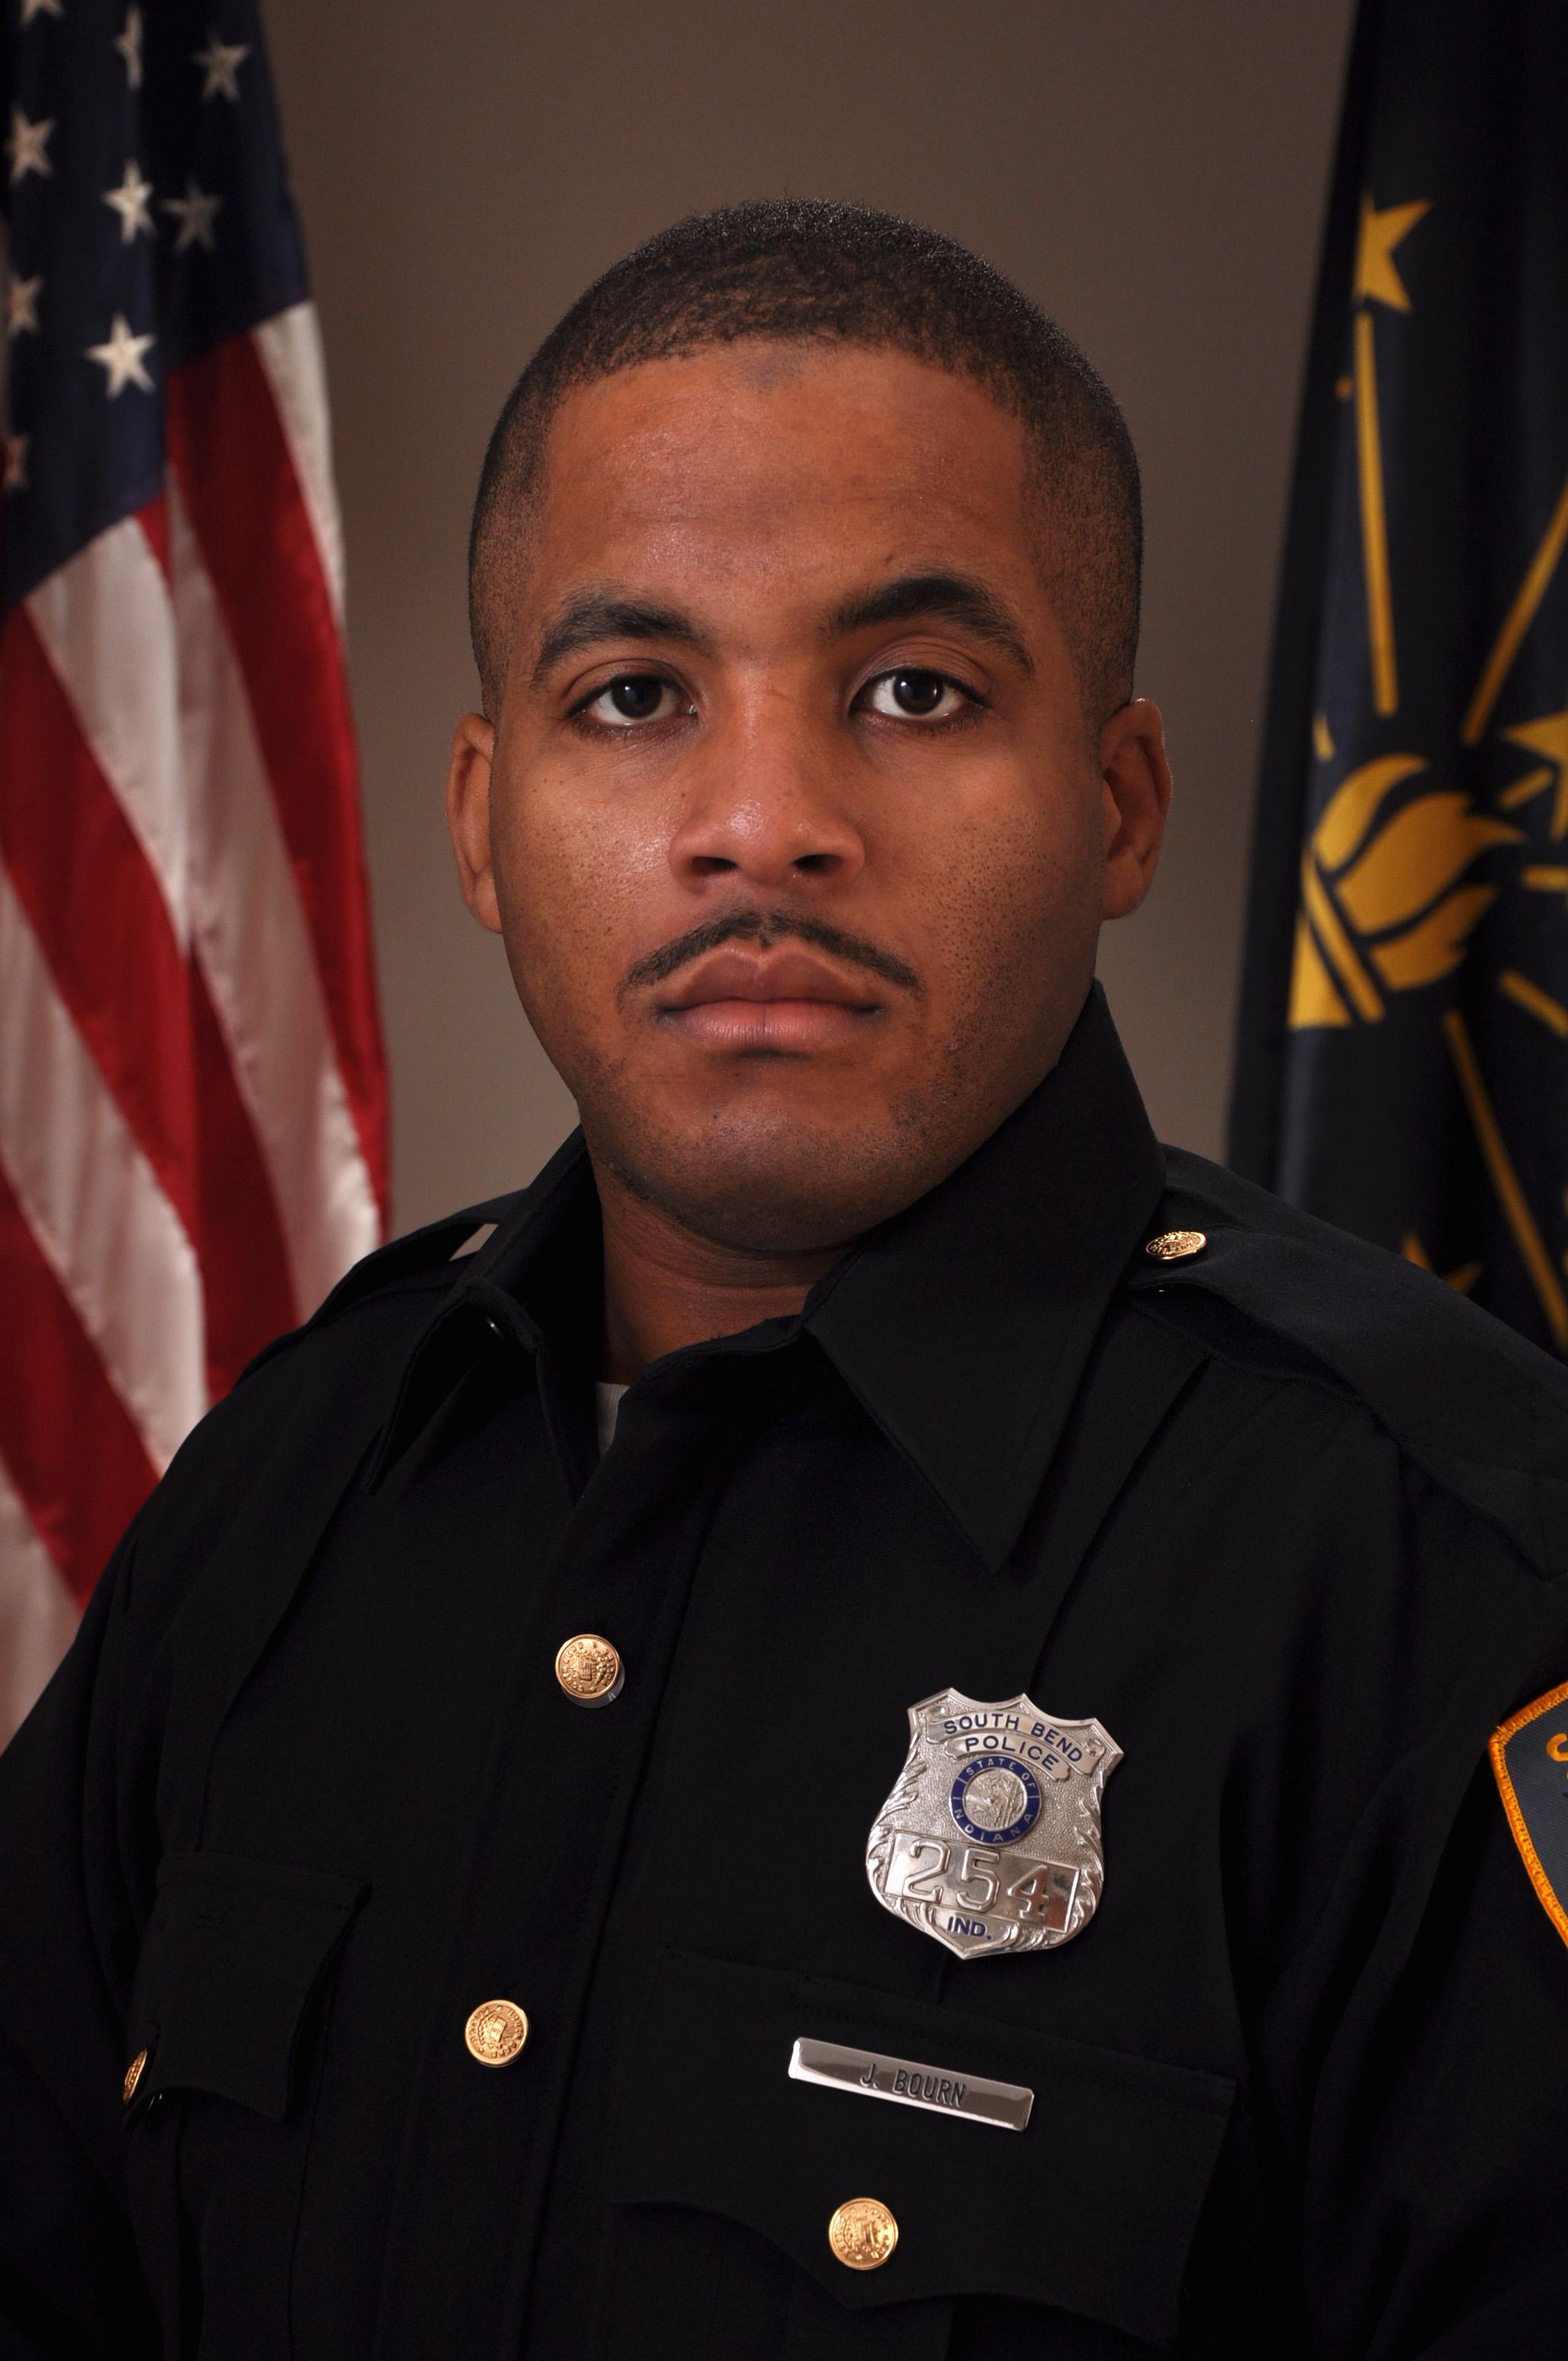 Jarveair Bourn | South Bend Police Department